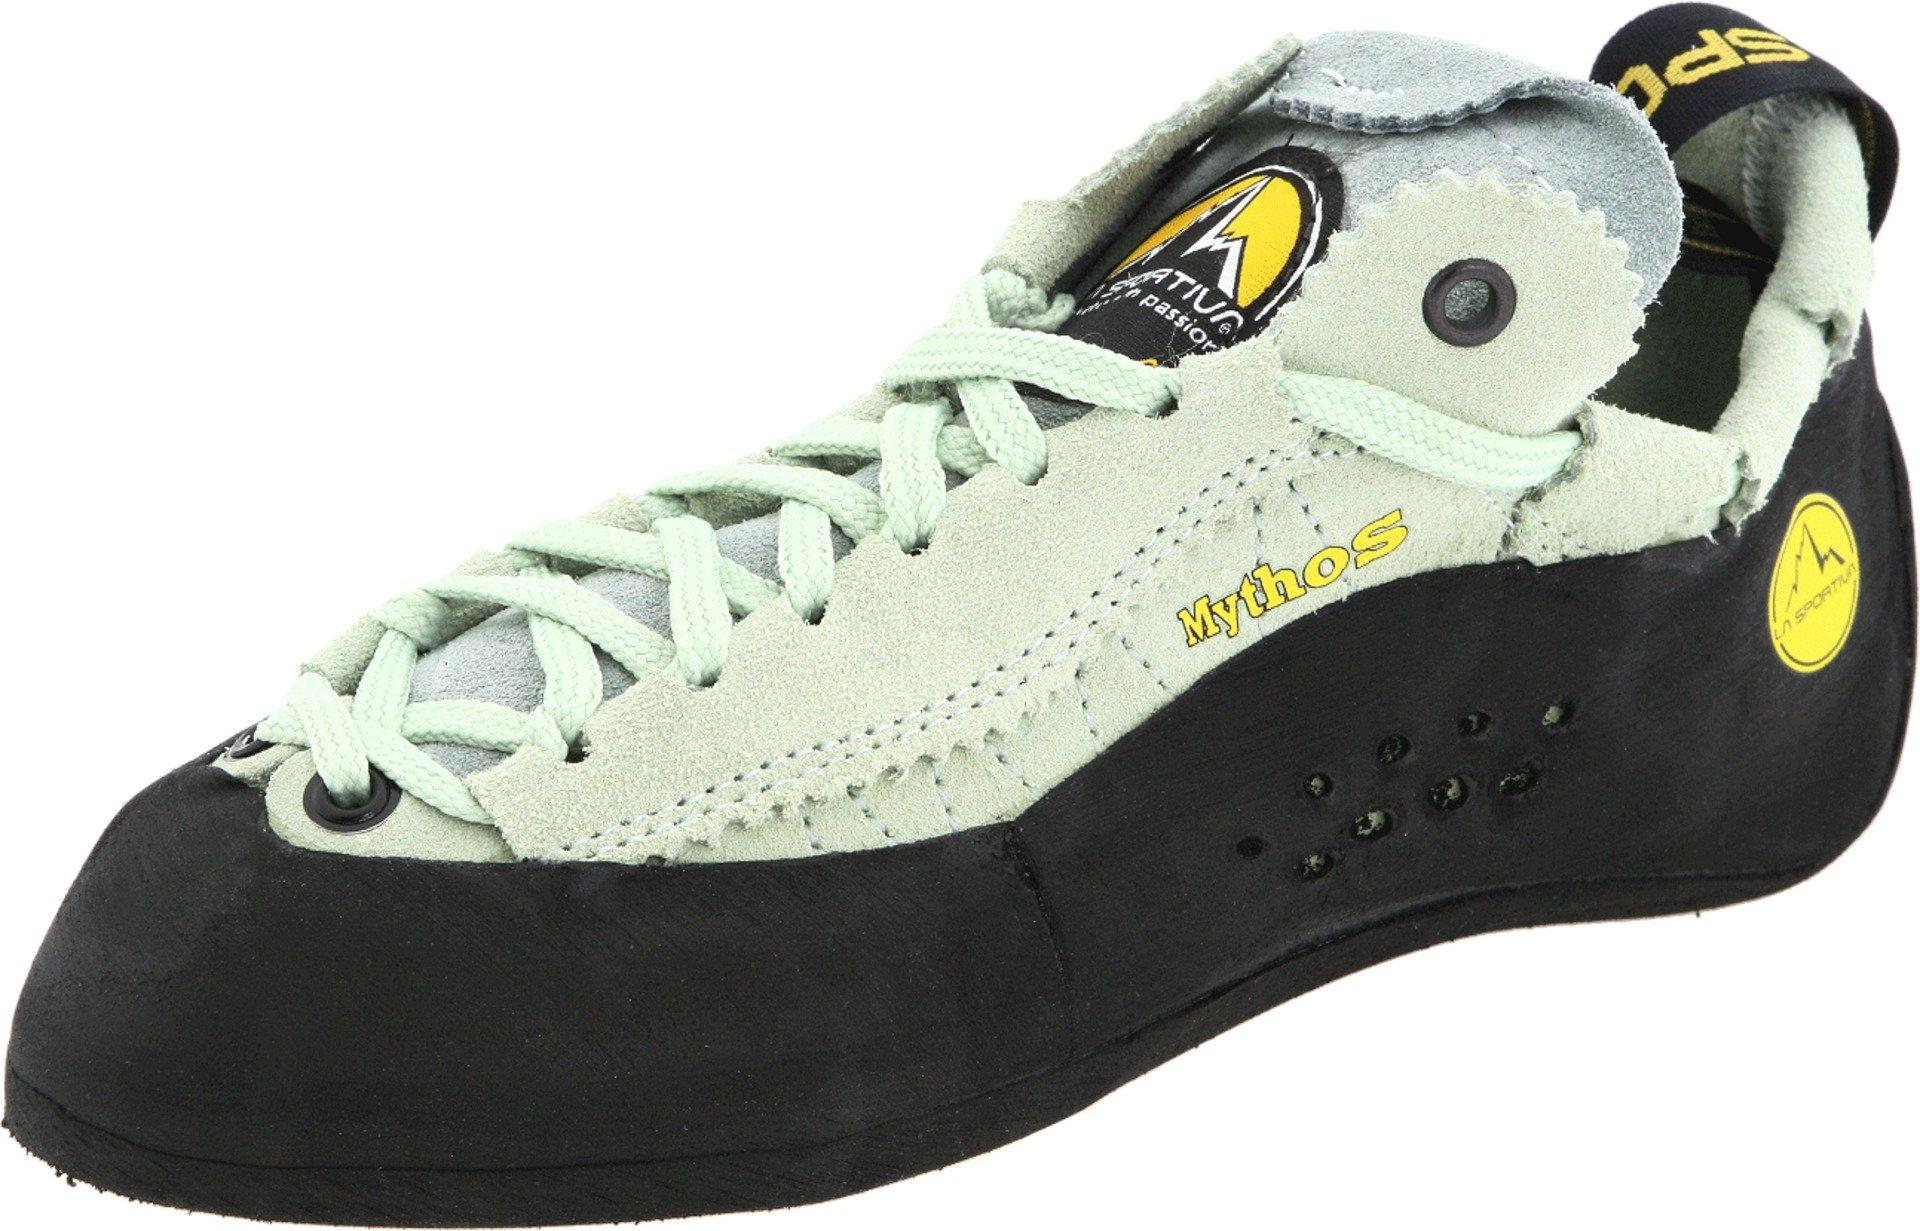 La Sportiva Mythos Lace-Up Climbing Shoe - Women's, Pistachio, 35.5 EU